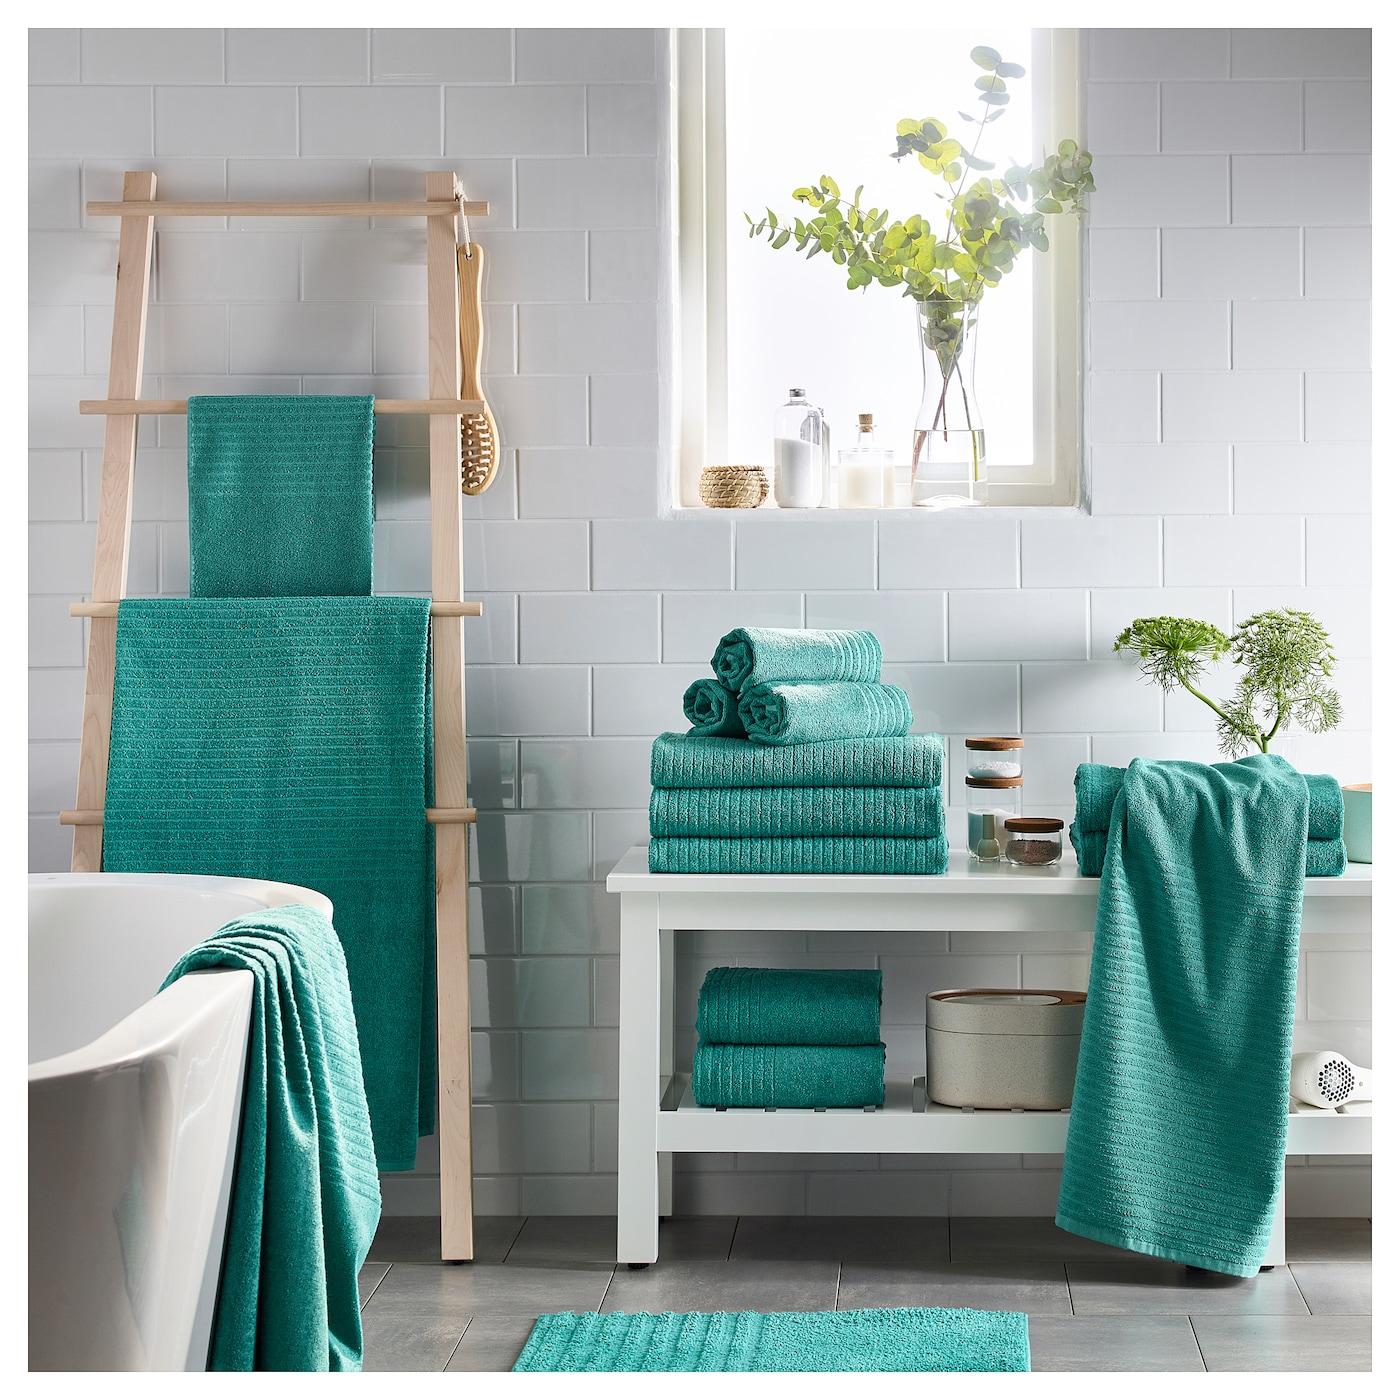 v gsj n drap de bain turquoise 70 x 140 cm ikea. Black Bedroom Furniture Sets. Home Design Ideas